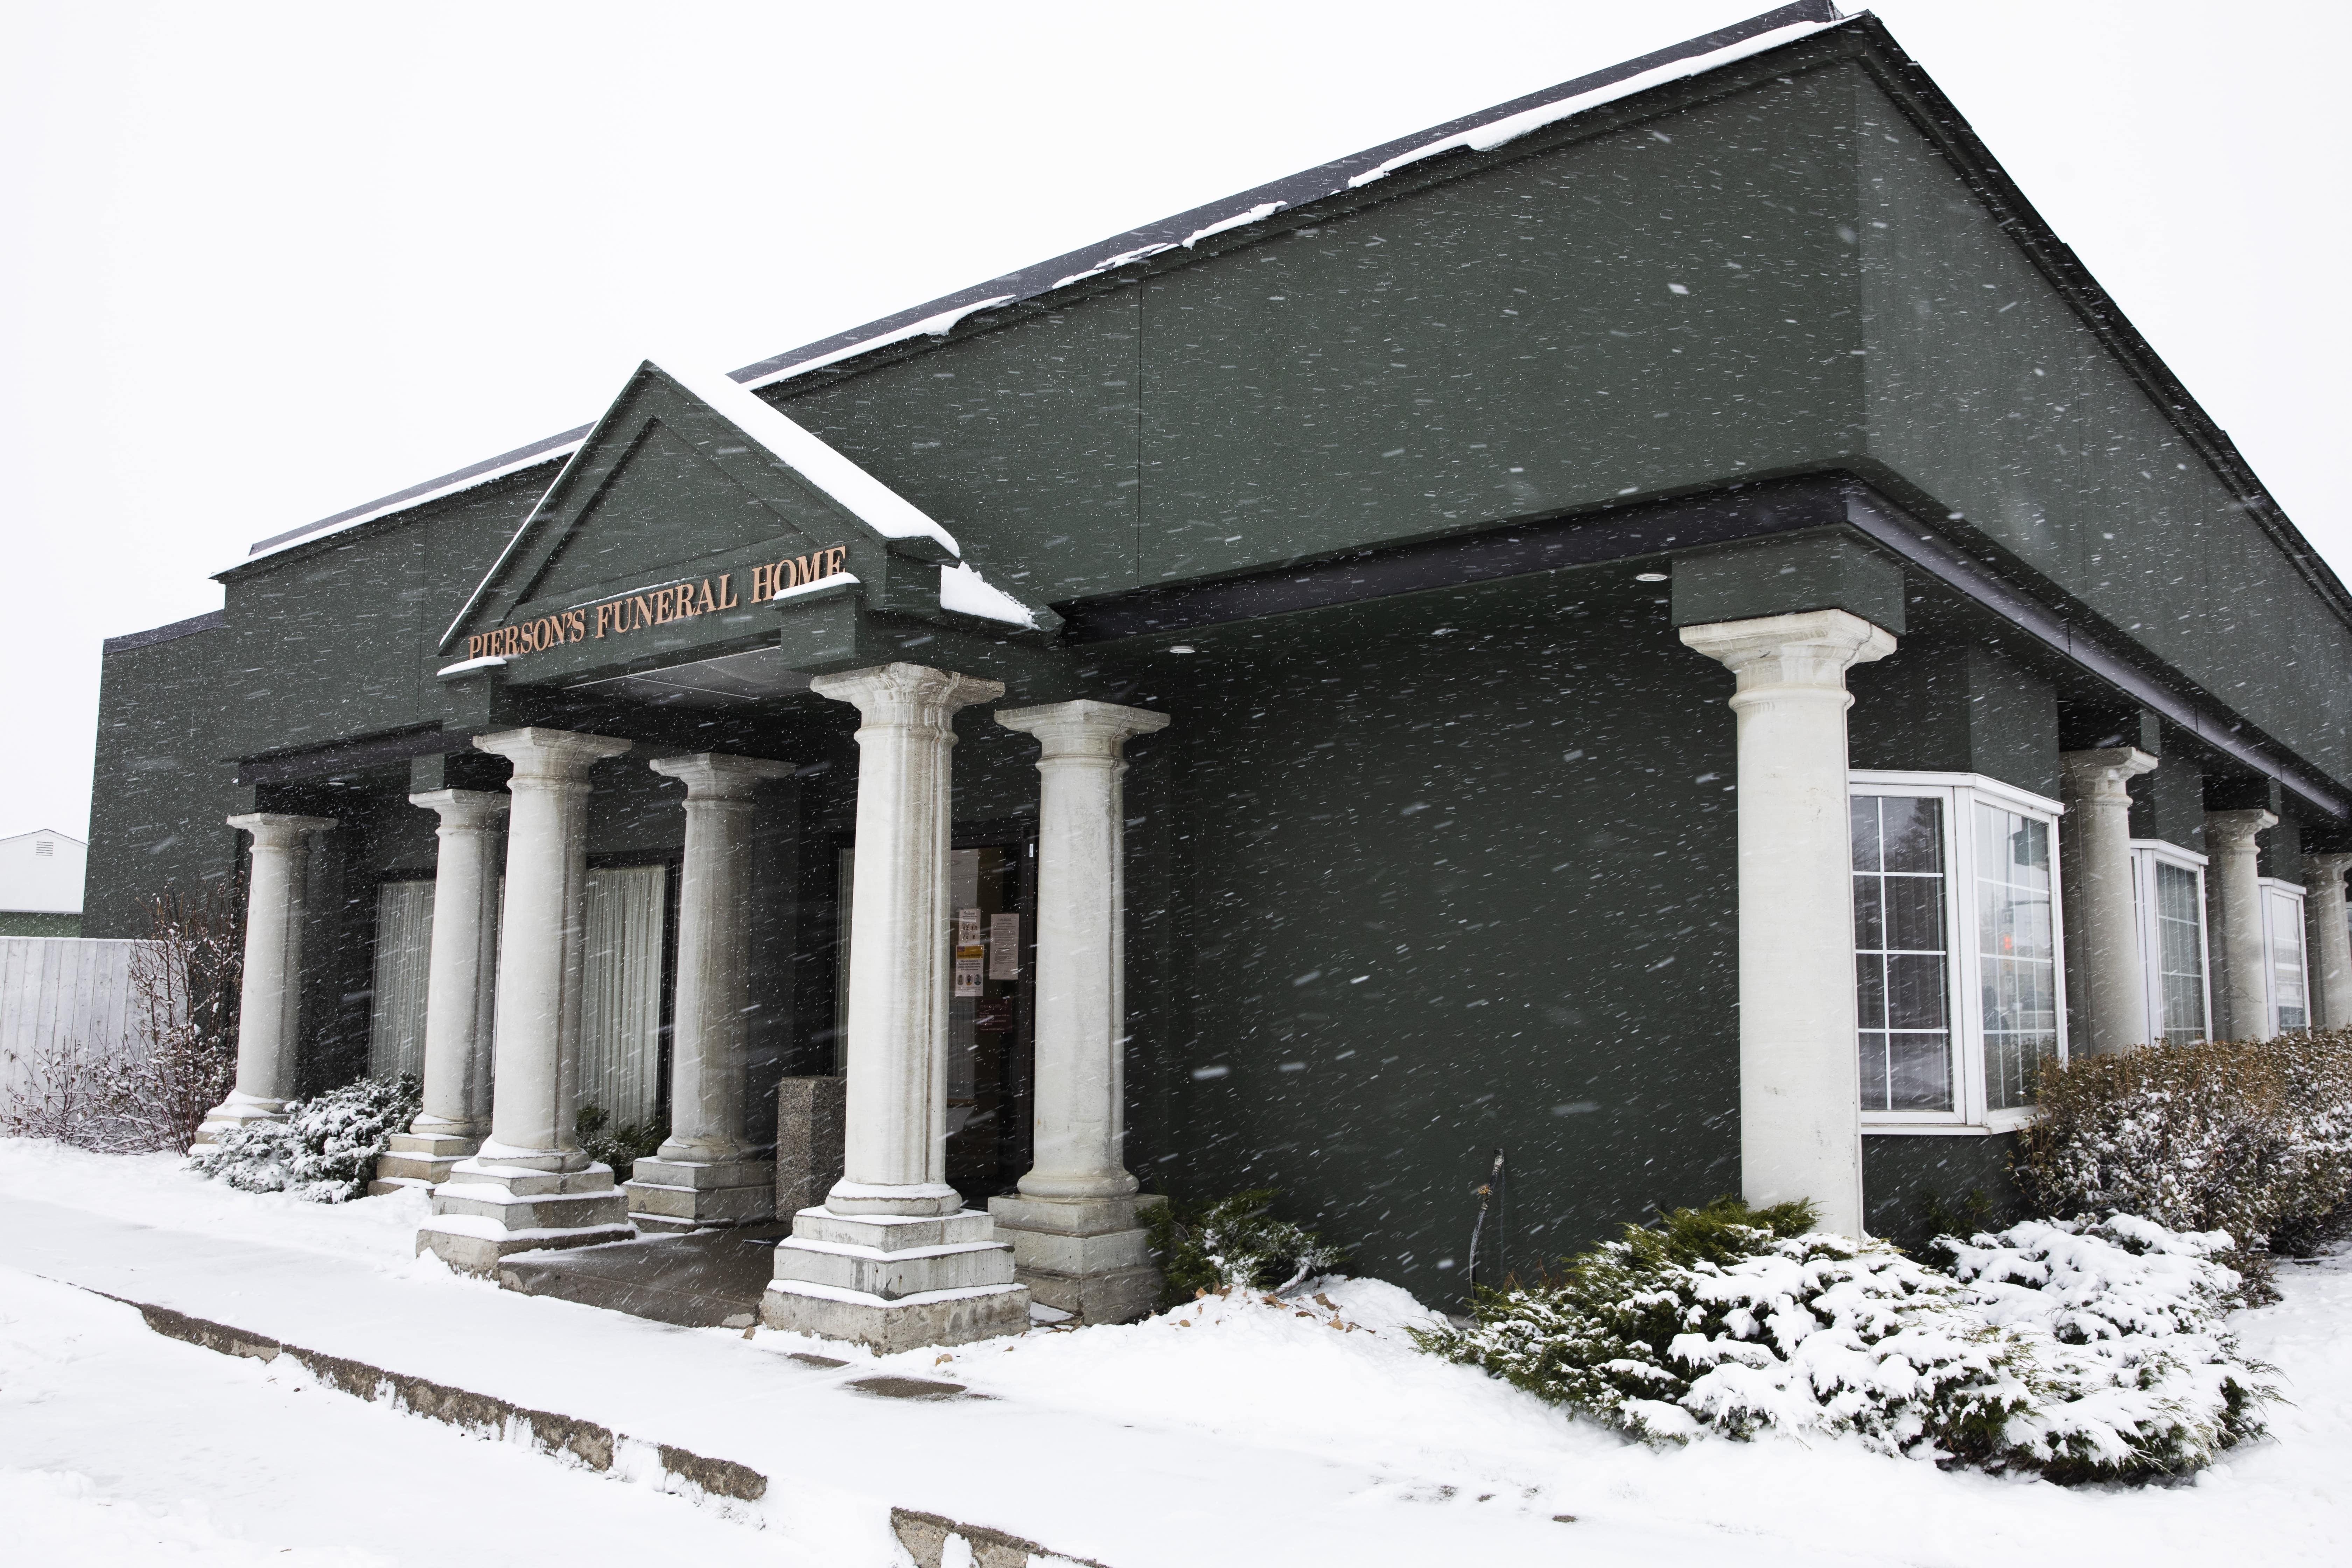 Outside-building-east-side-in-snow-Nov-2020-min